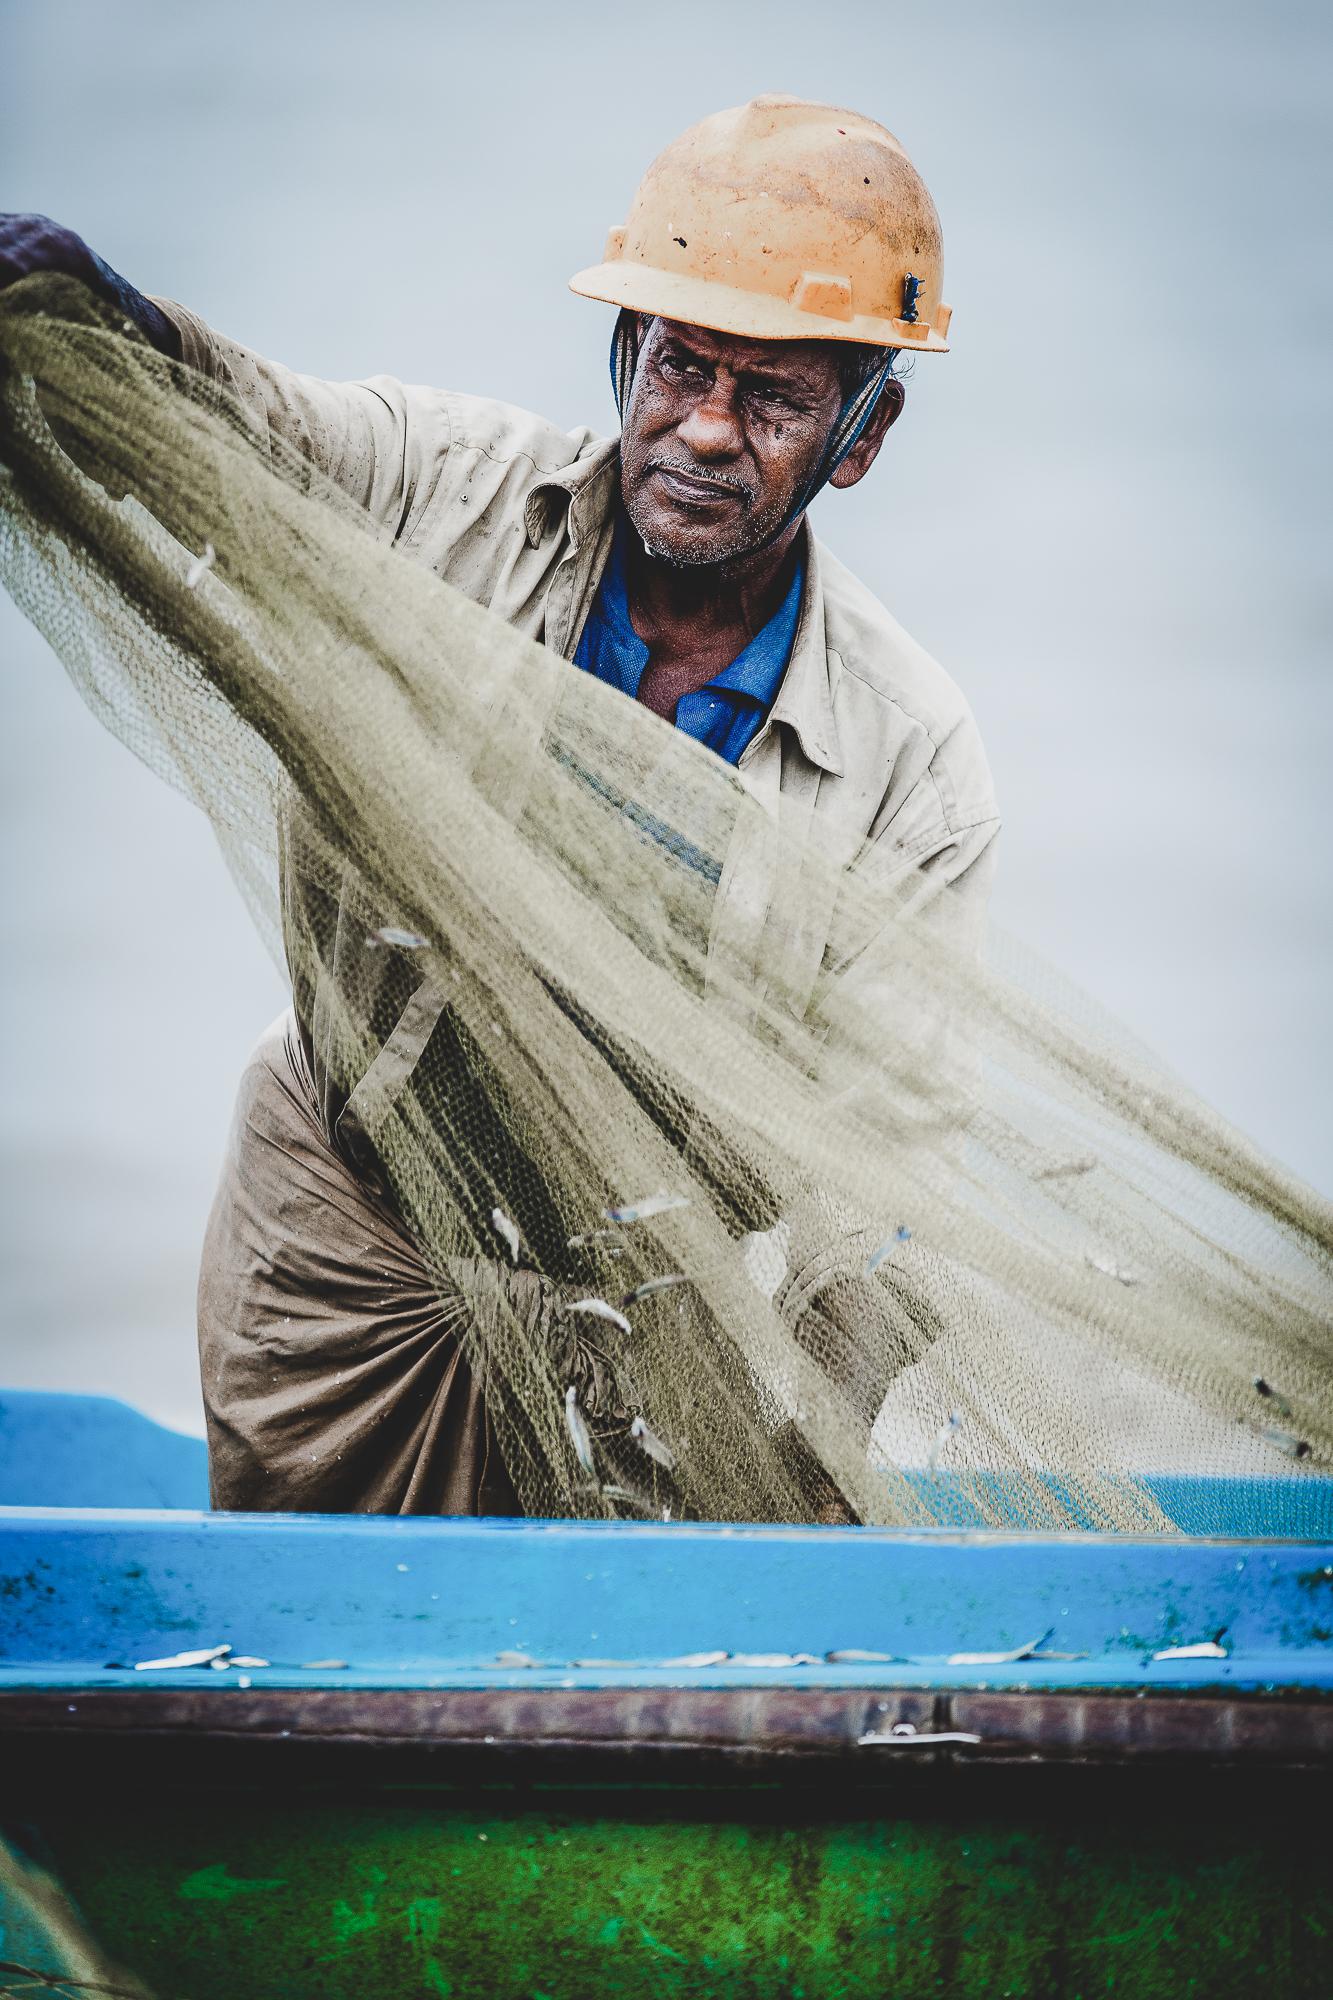 Fisherman Unloading His Net